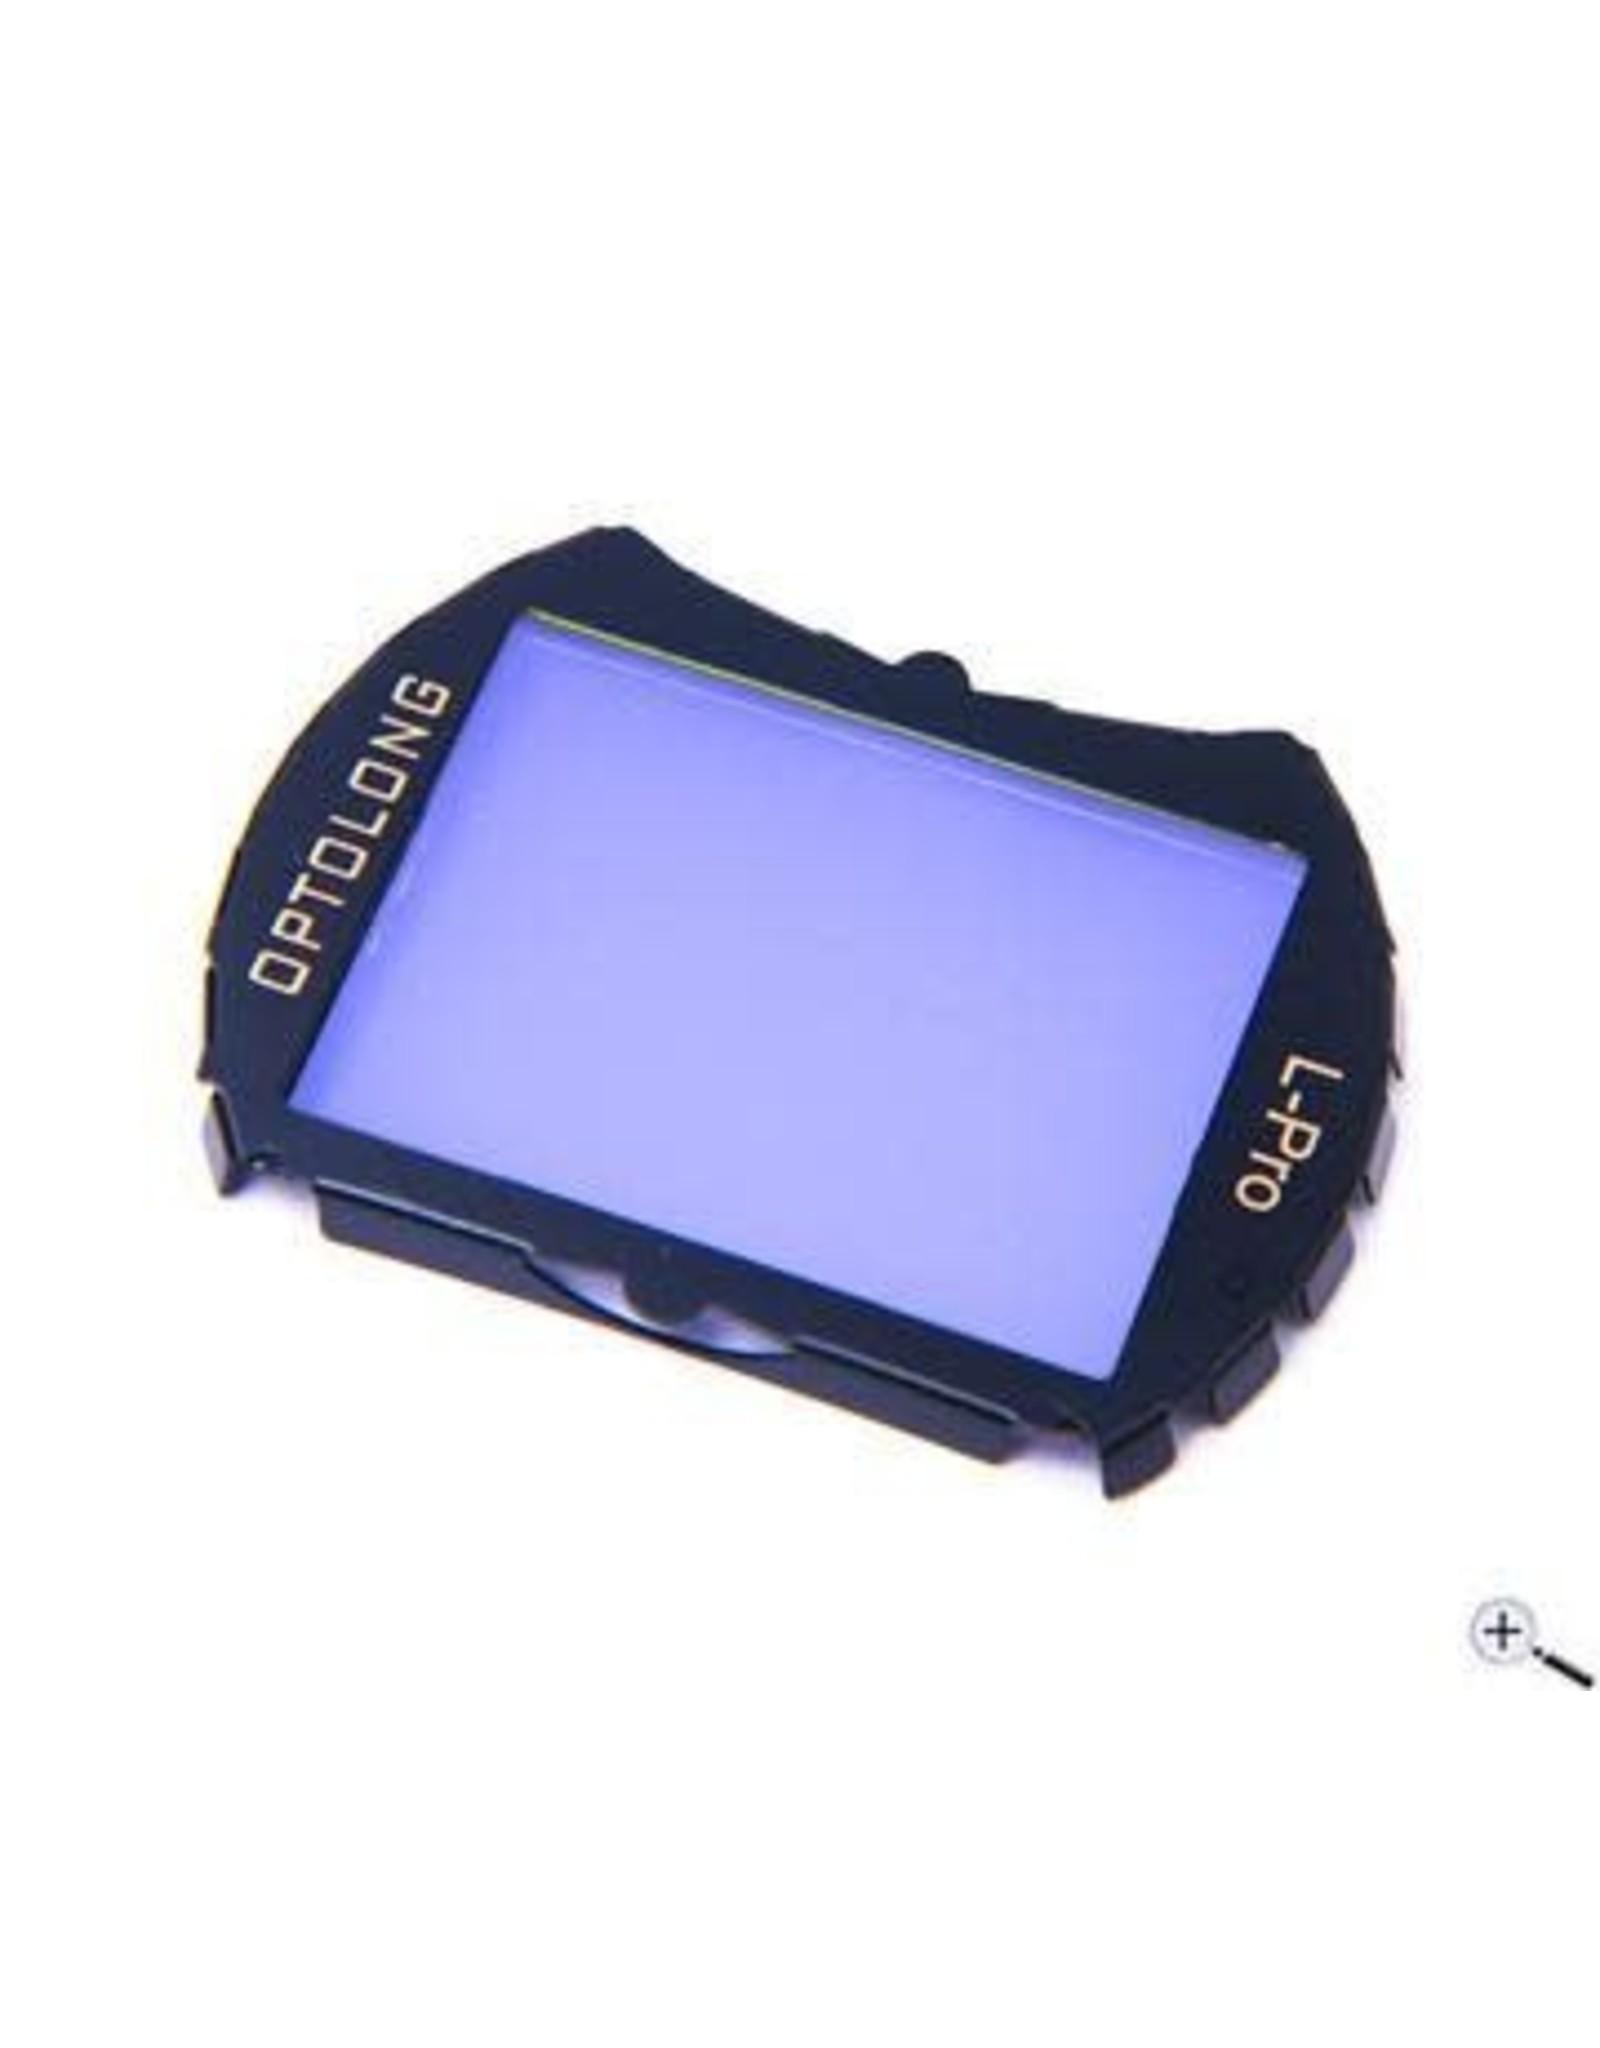 Optolong Optolong L-Pro Filter Sony SON-FF Full Frame Clip Filter